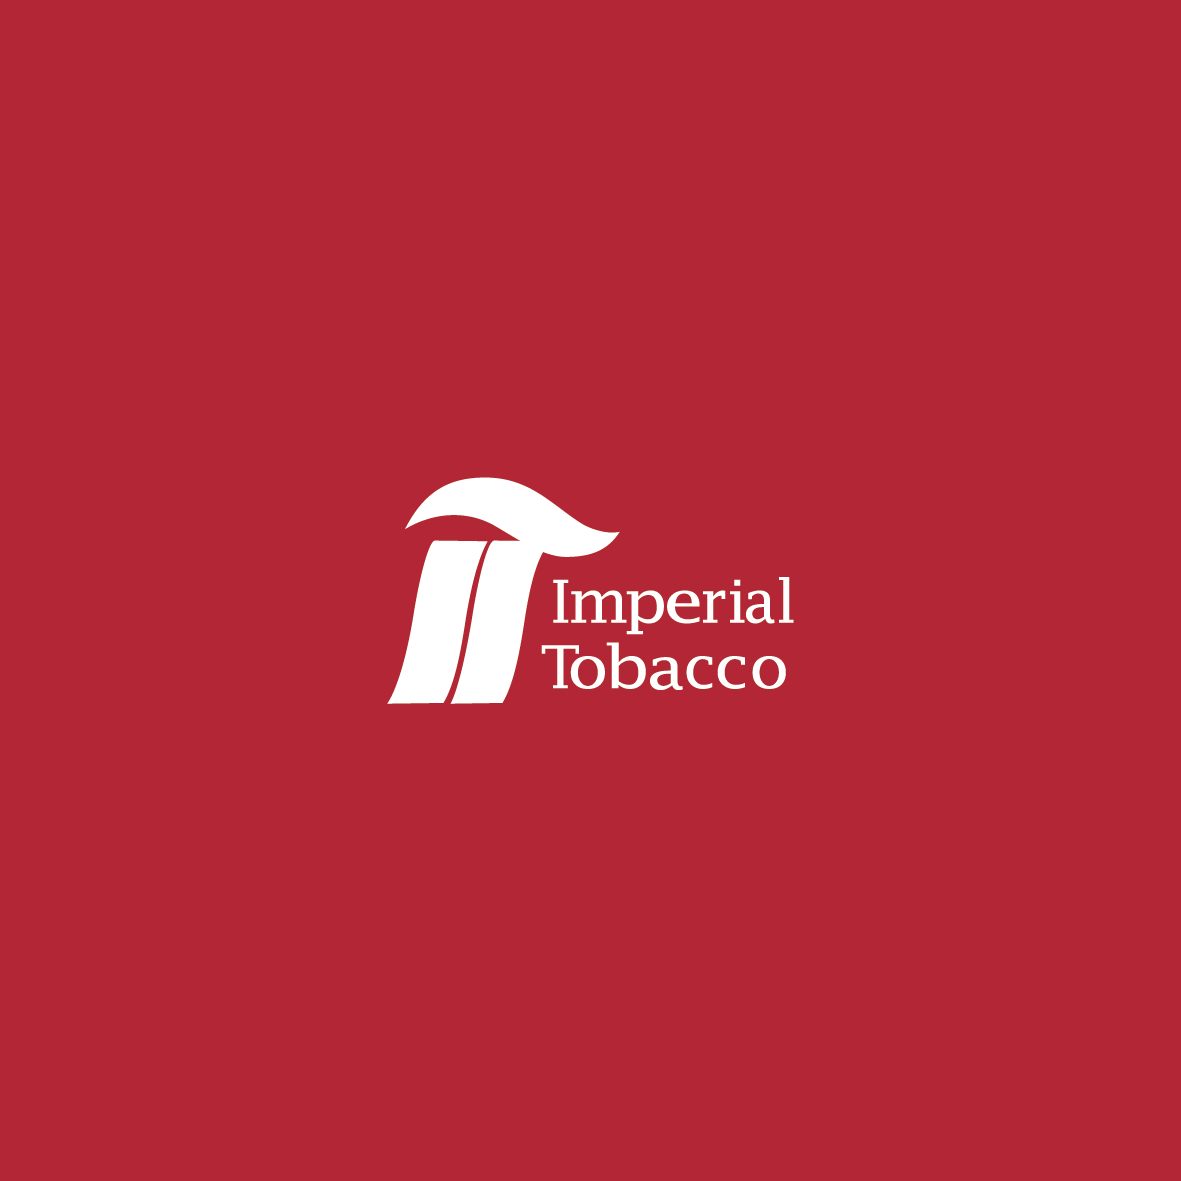 Imperial Tobacco帝國菸草-logo